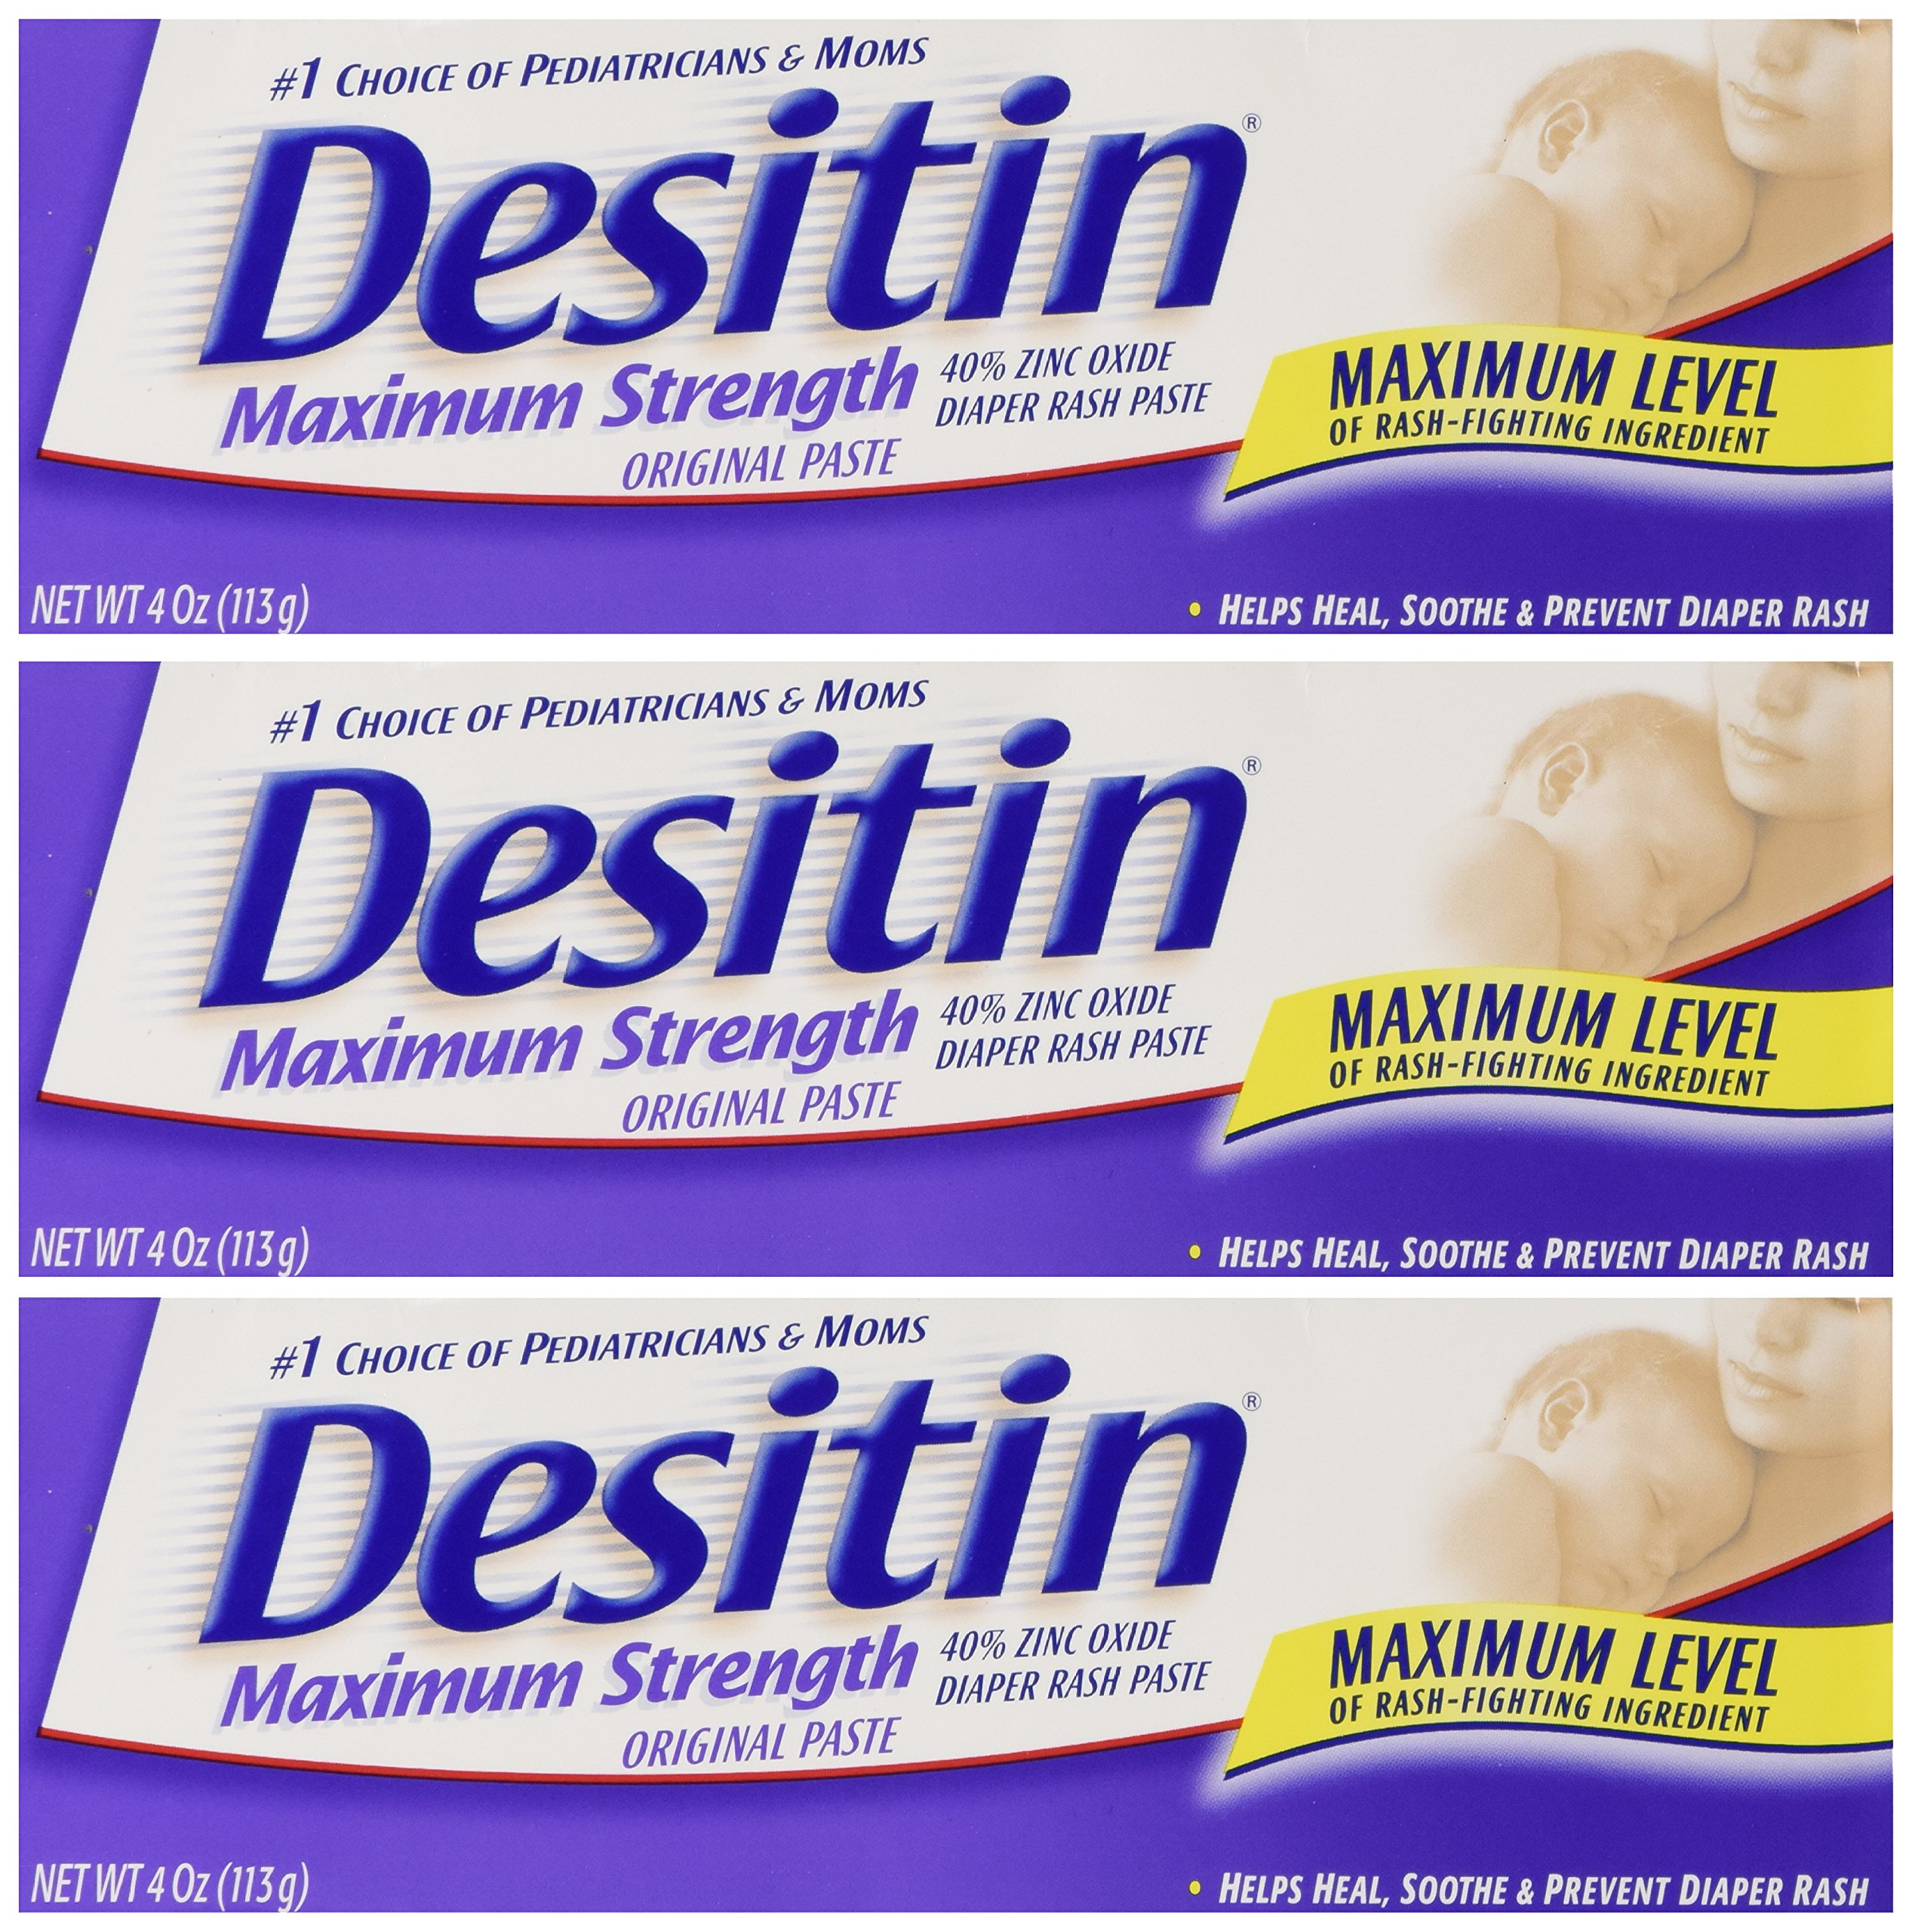 Desitin Maximum Strength Original Diaper Rash Paste 4 oz tube (Pack of 3)